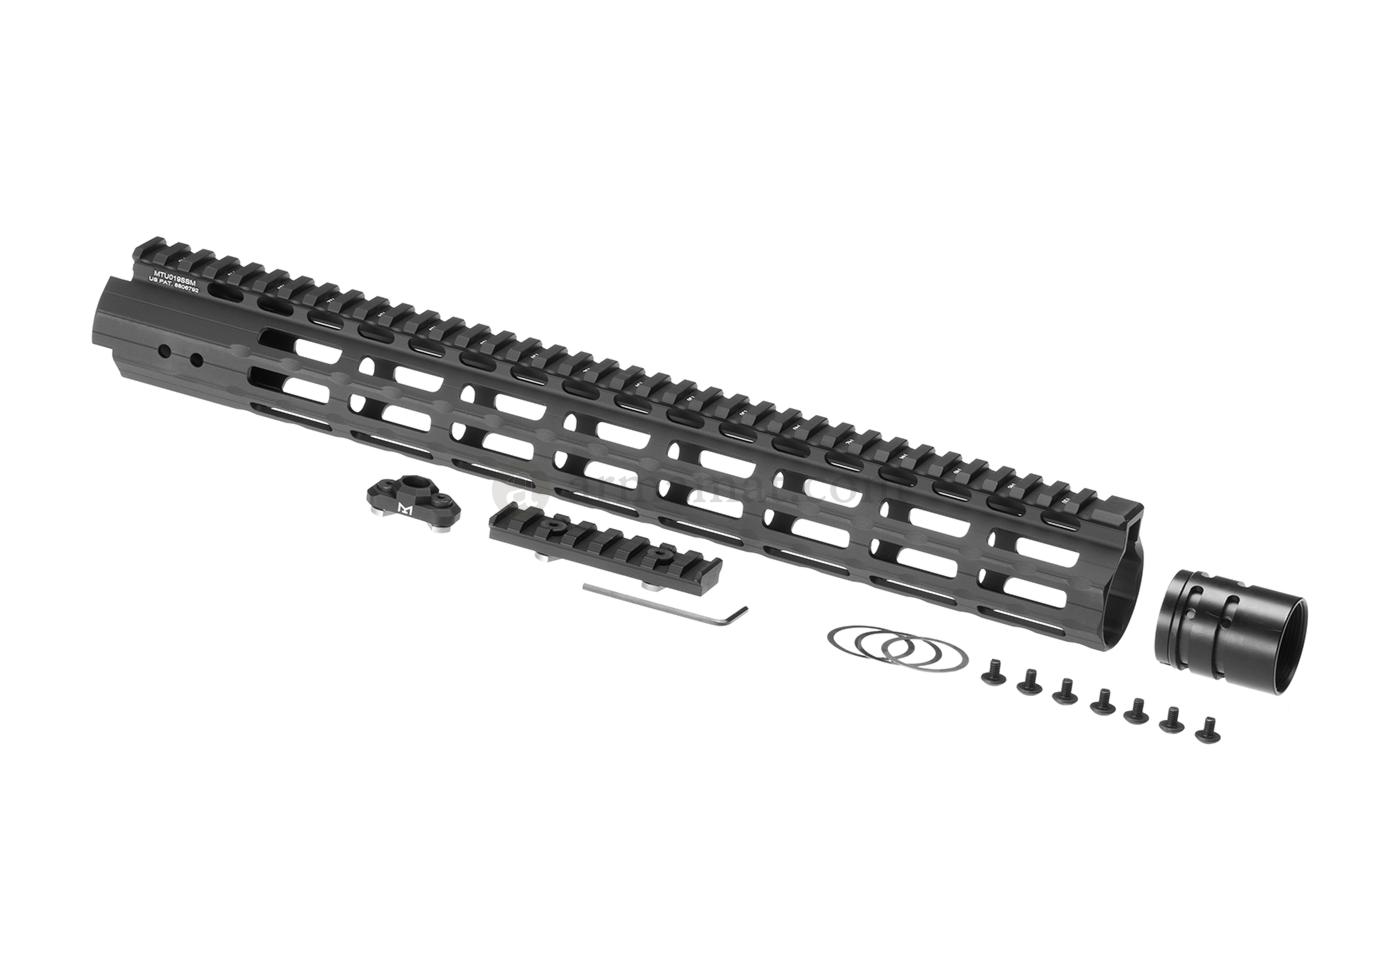 AR-15 15 Inch Super Slim Free Float Handguard M-Lok